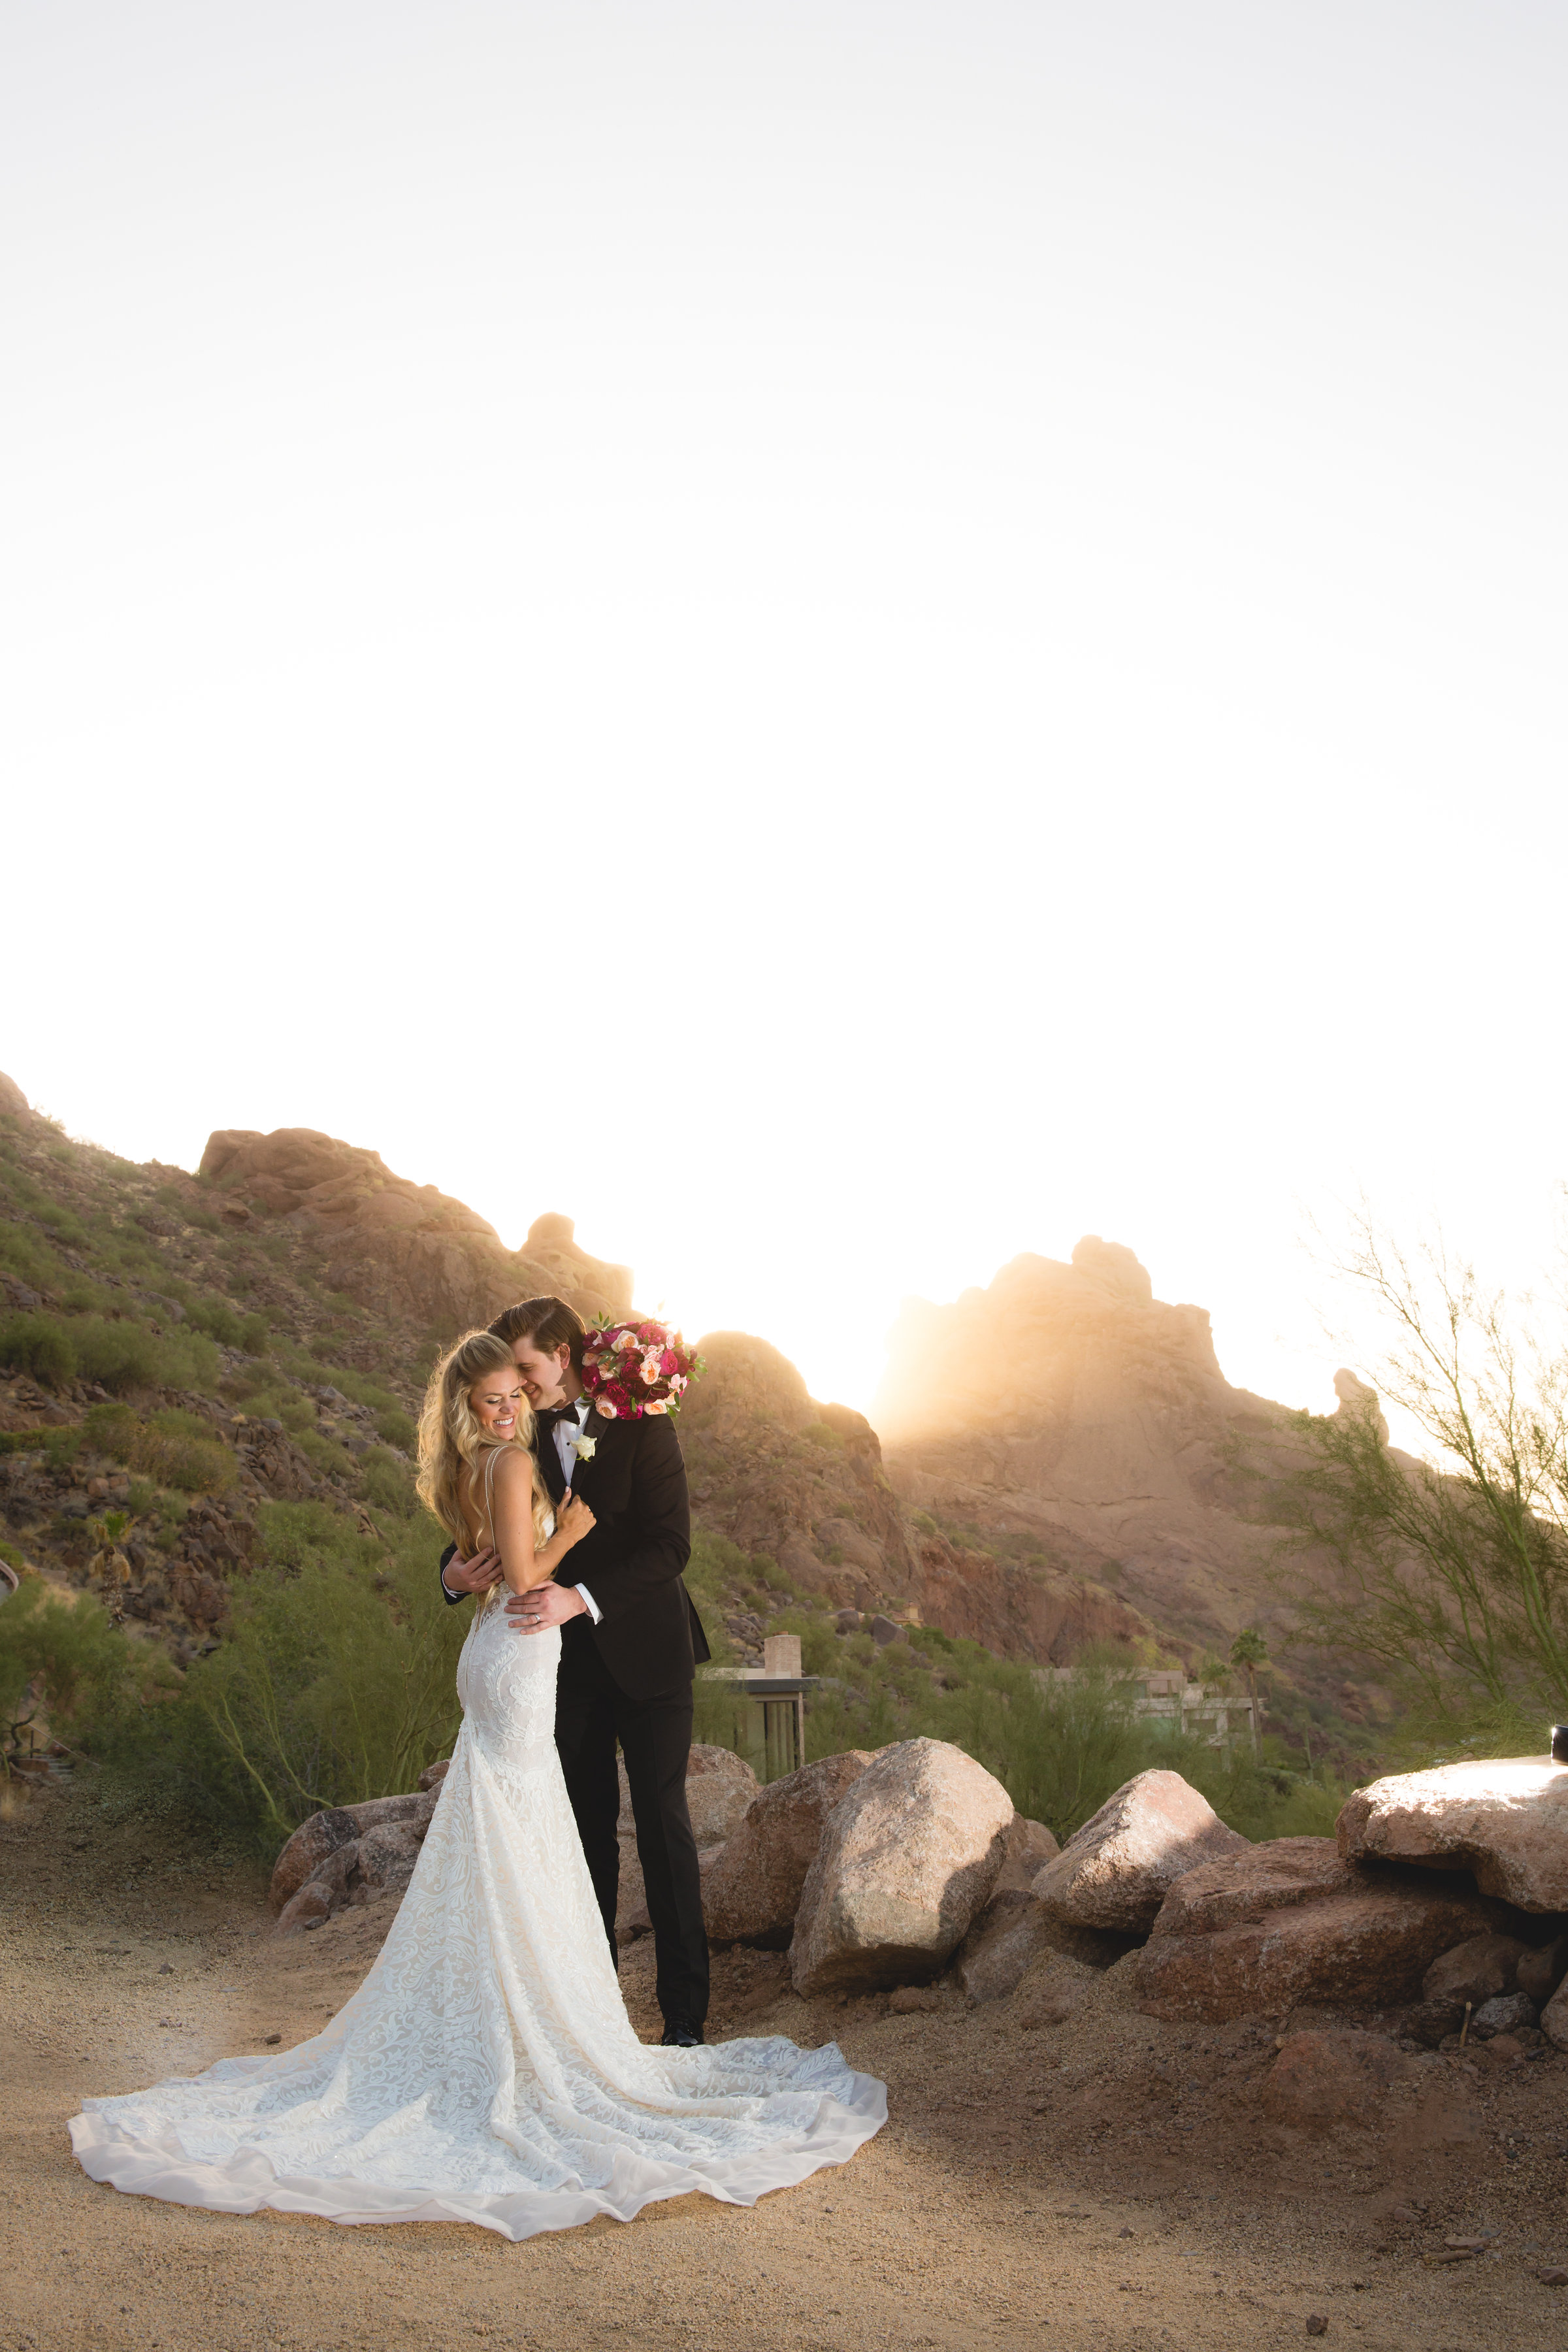 ScottsdalePhotographersWedding-400.jpg